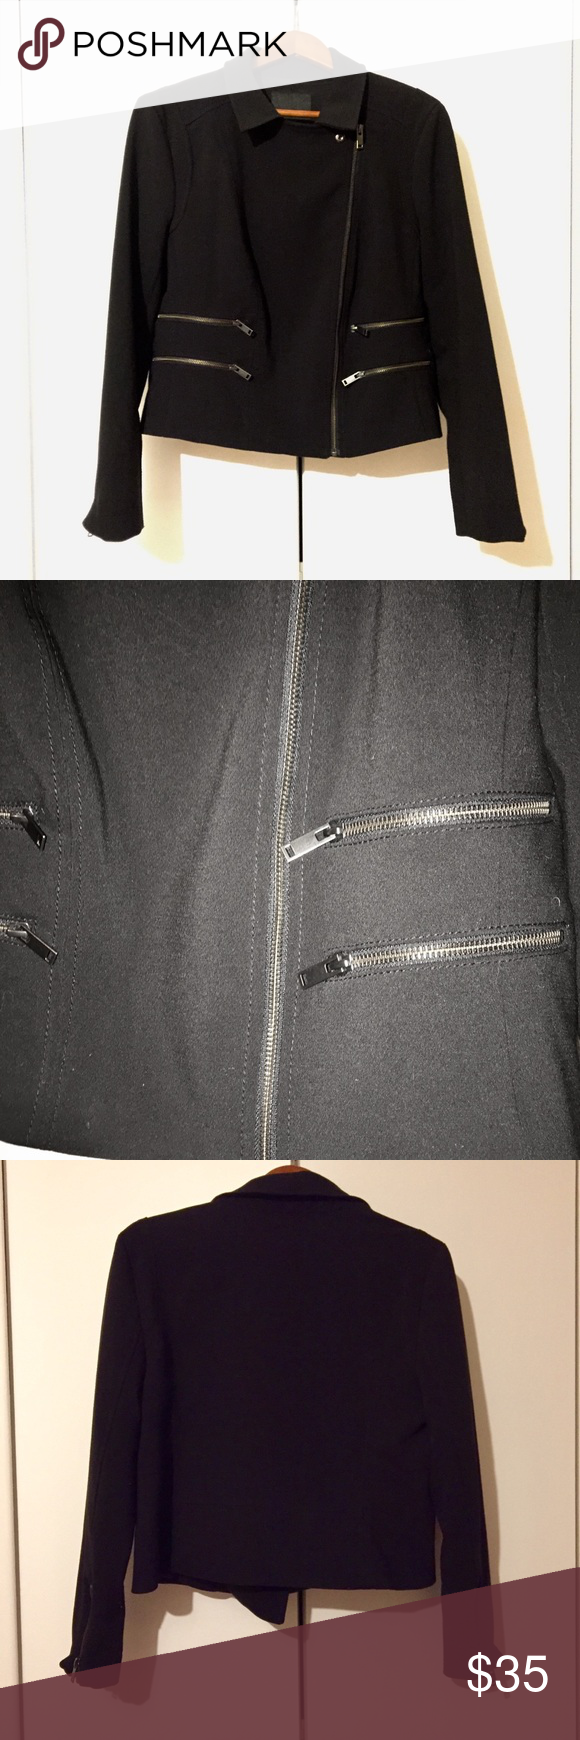 Banana Republic Black Moto Jacket Zippers 14 Black moto